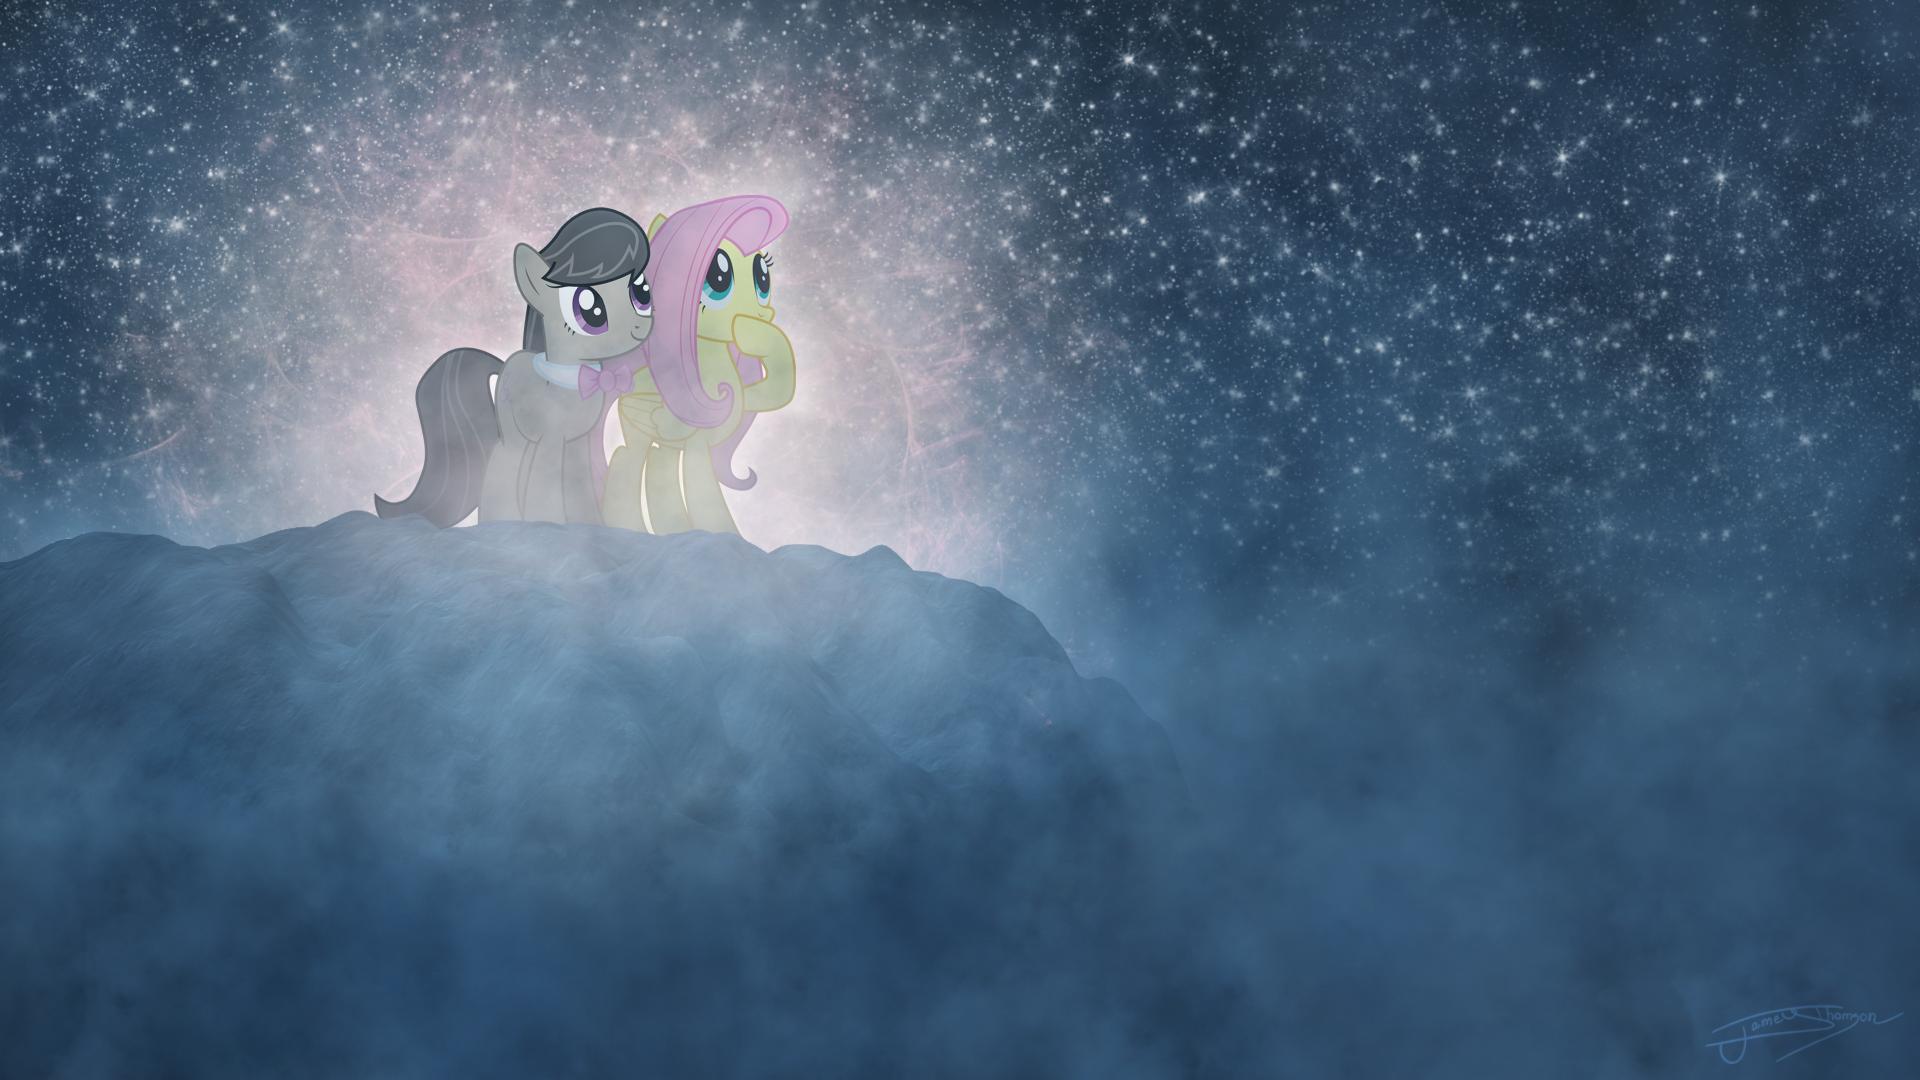 A Night of Stargazing